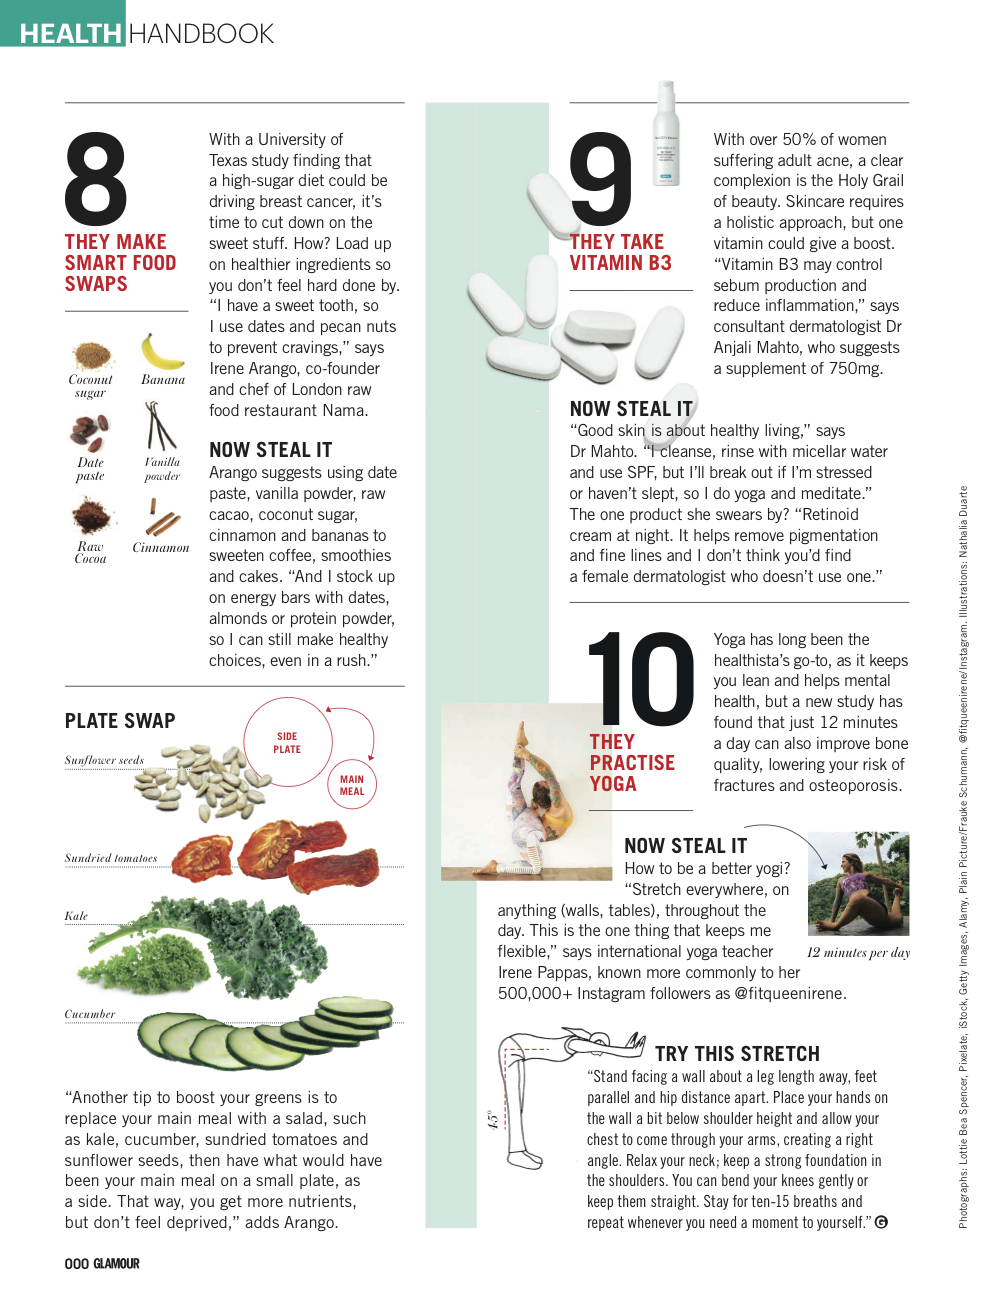 HealthyHabits 4.jpg